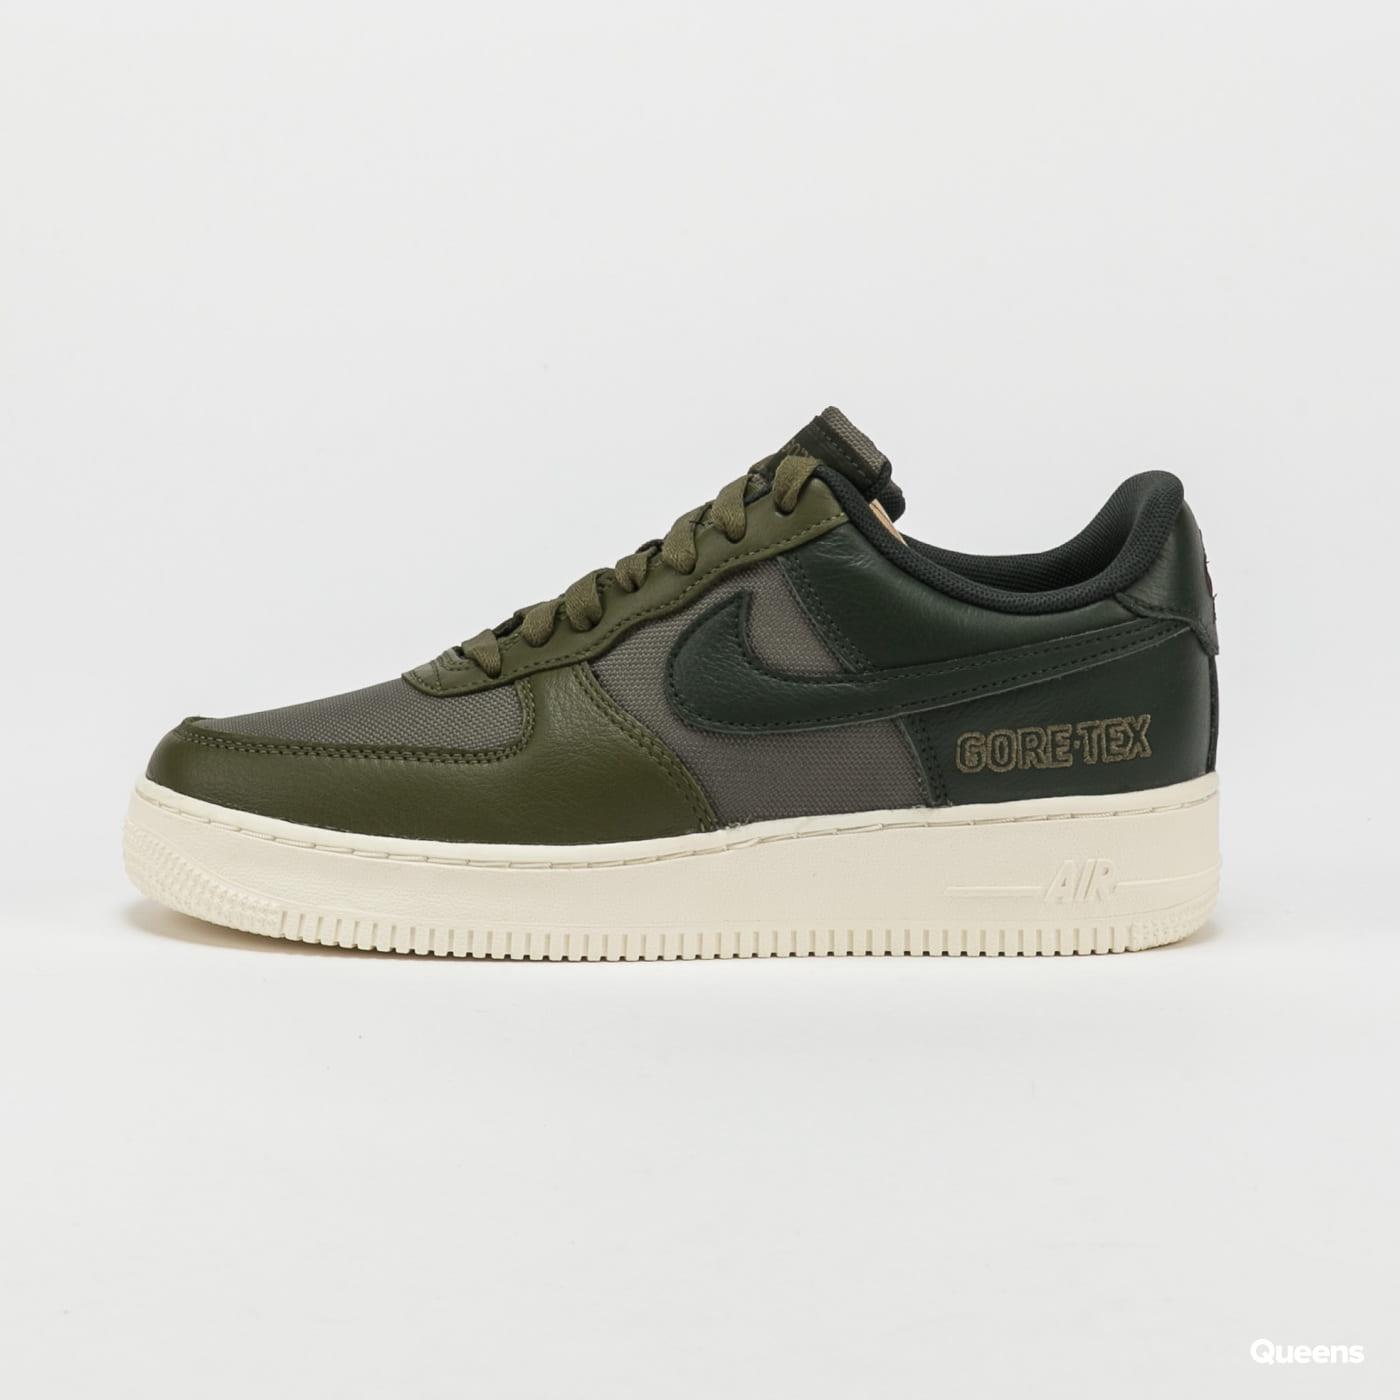 Nike Air Force 1 GTX medium olive / deepest green